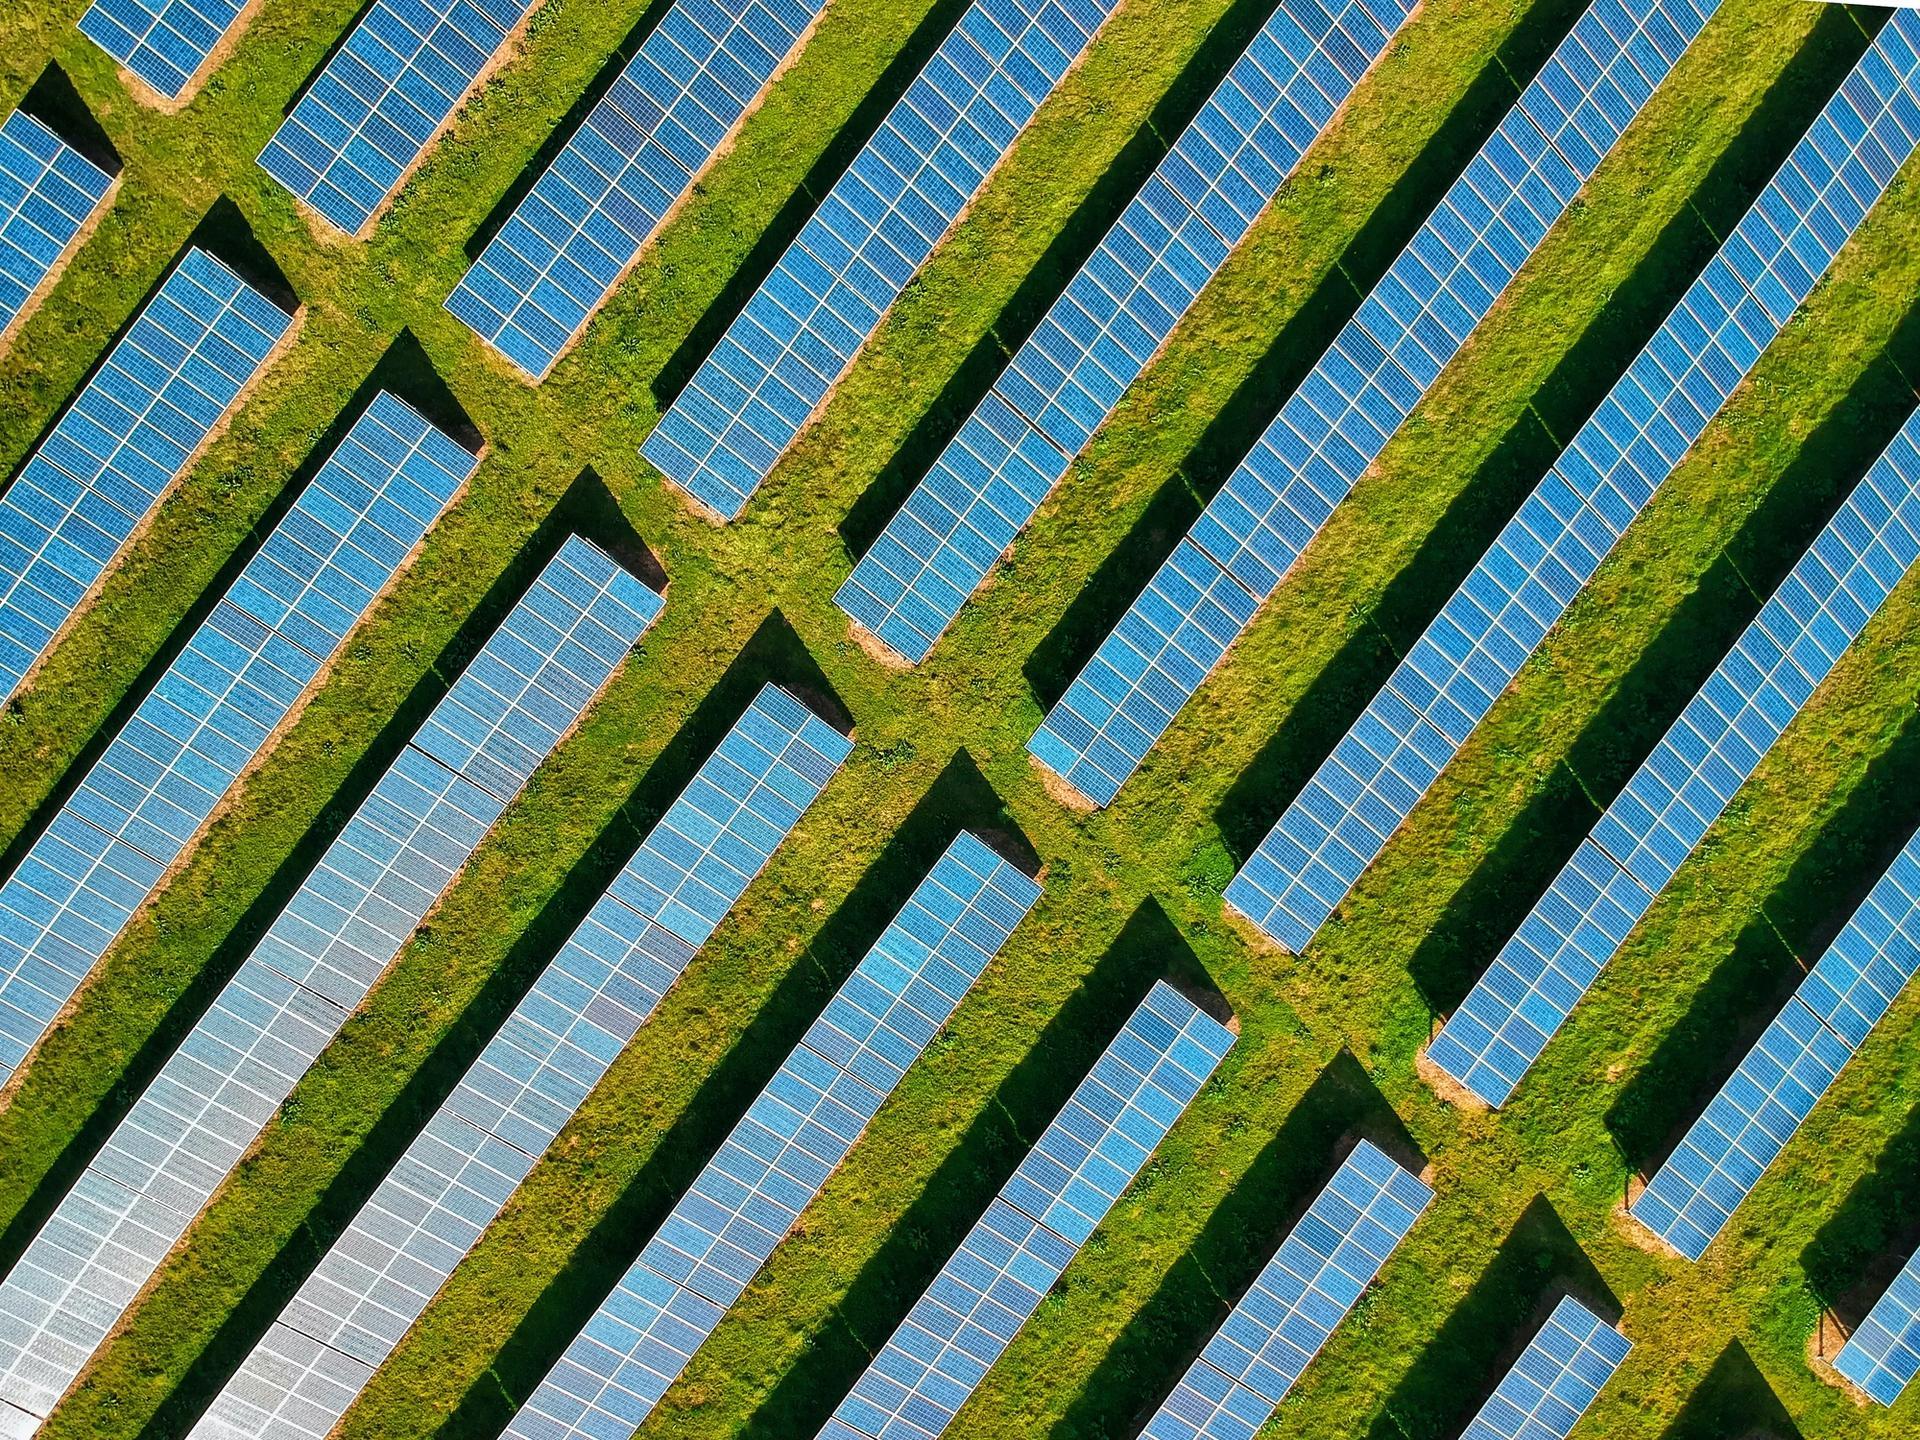 Amortizacion paneles fotovoltaicos